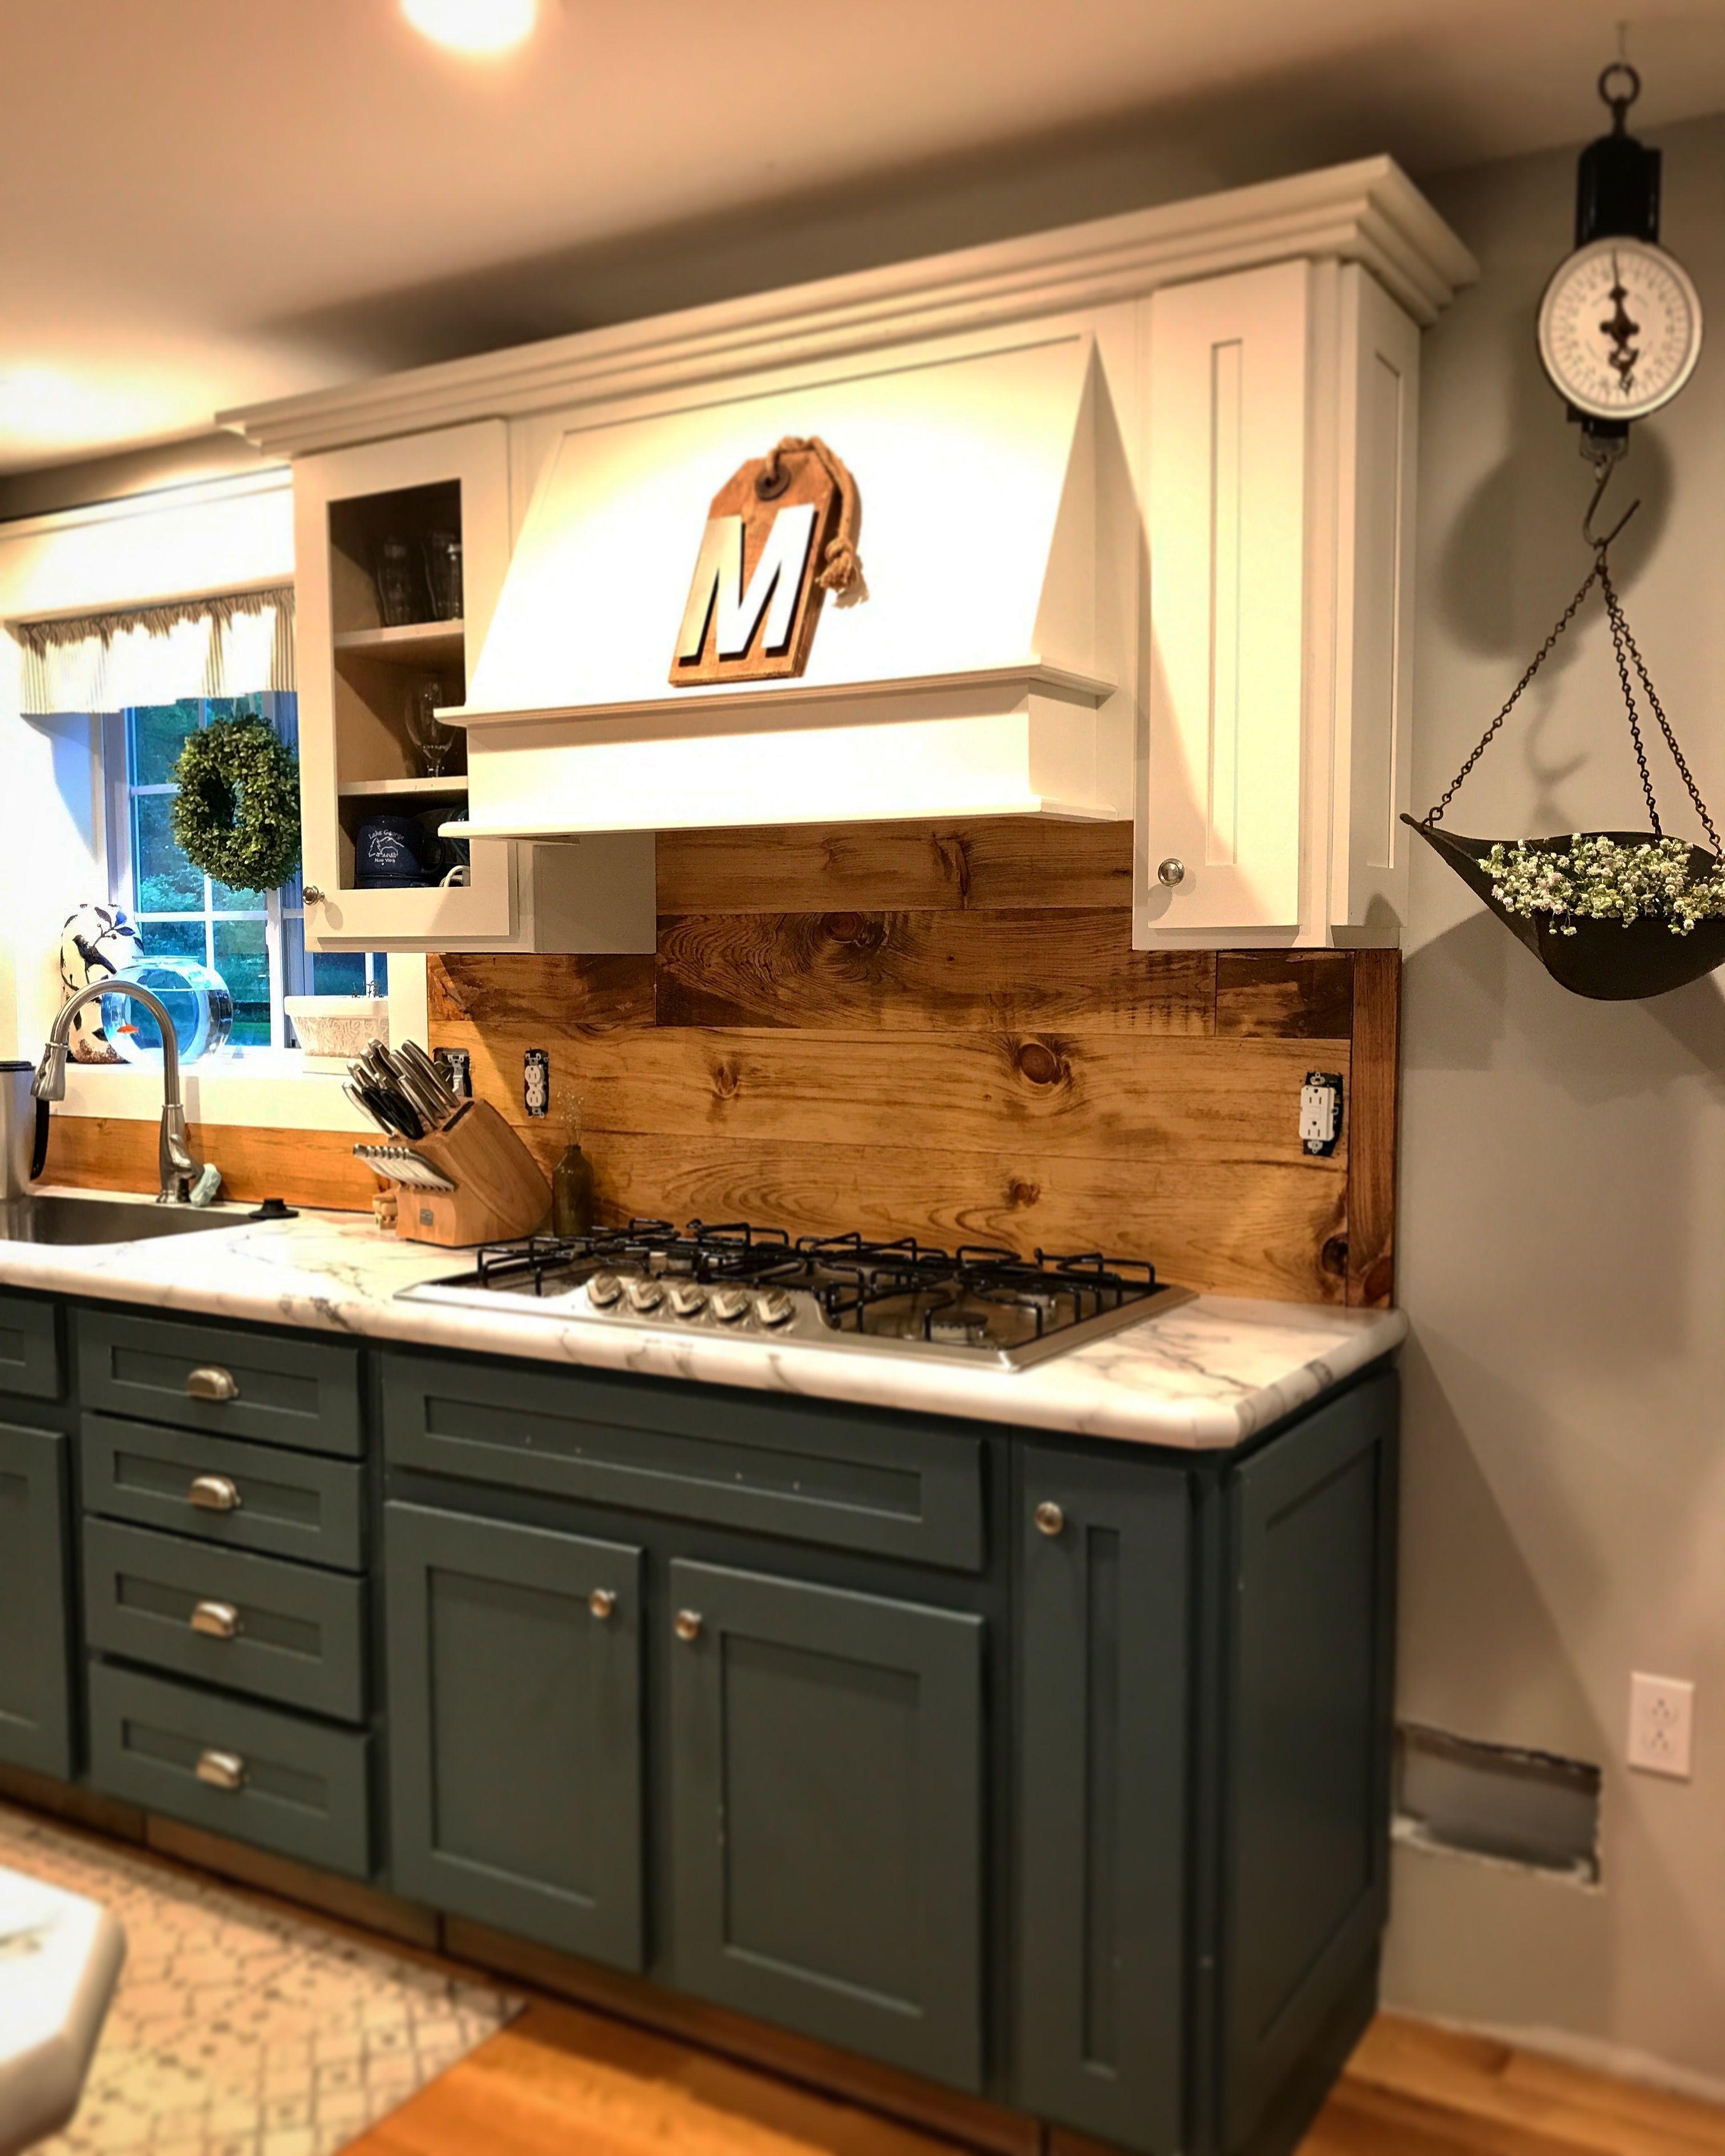 12 Shiplap As Kitchen Backsplash Collections In 2020 Kitchen Backsplash Easy Kitchen Backsplash Kitchen Backsplash Designs